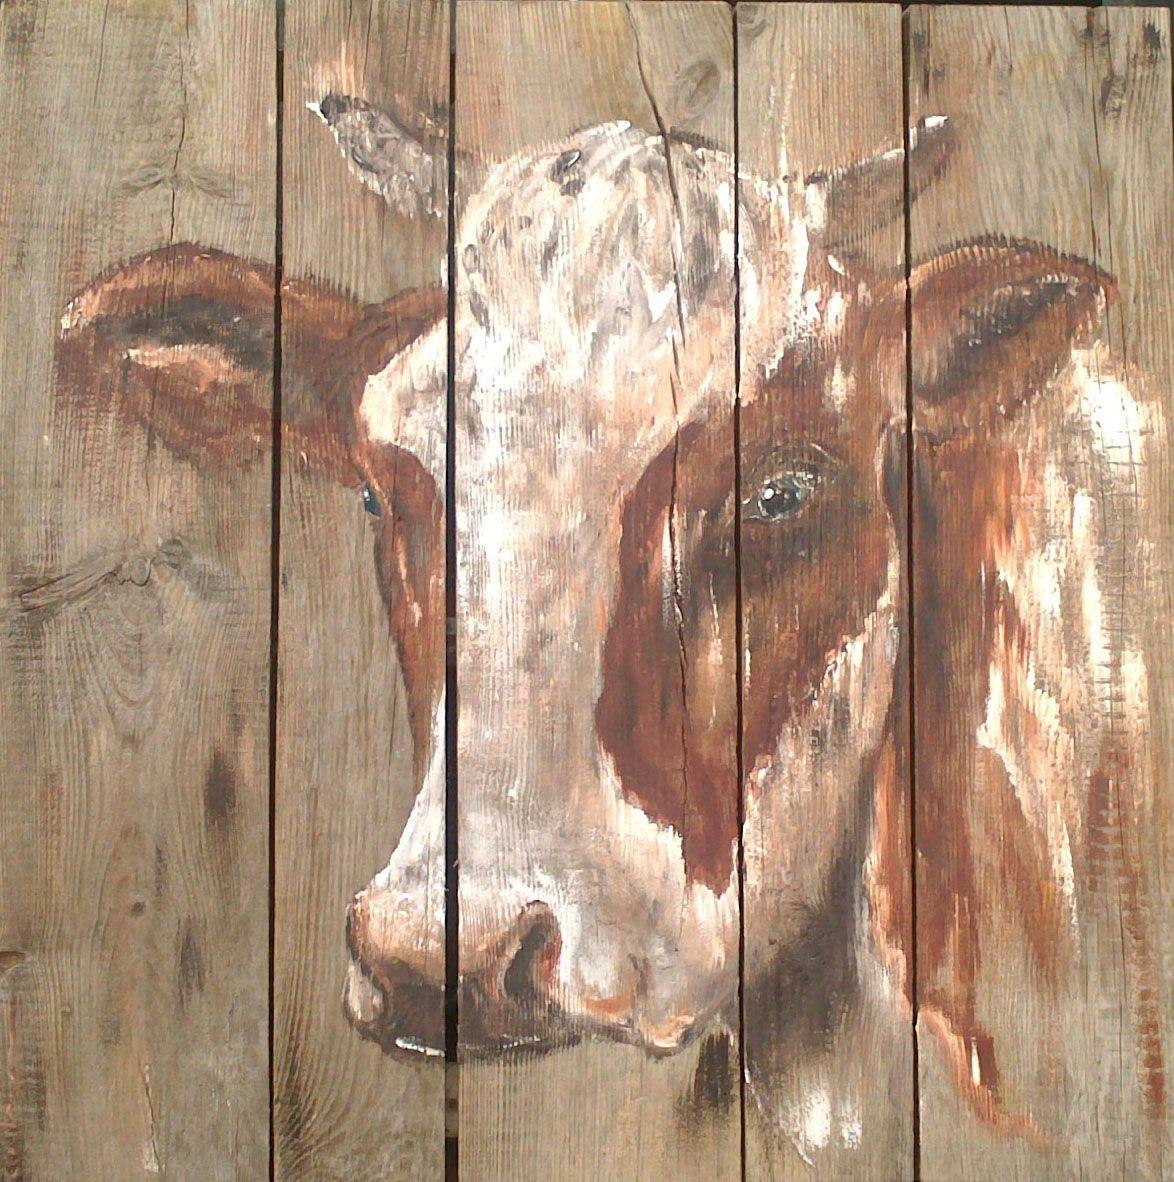 Hedendaags schilderen op hout - Google Search   Koeien schilderen, Hout SE-82